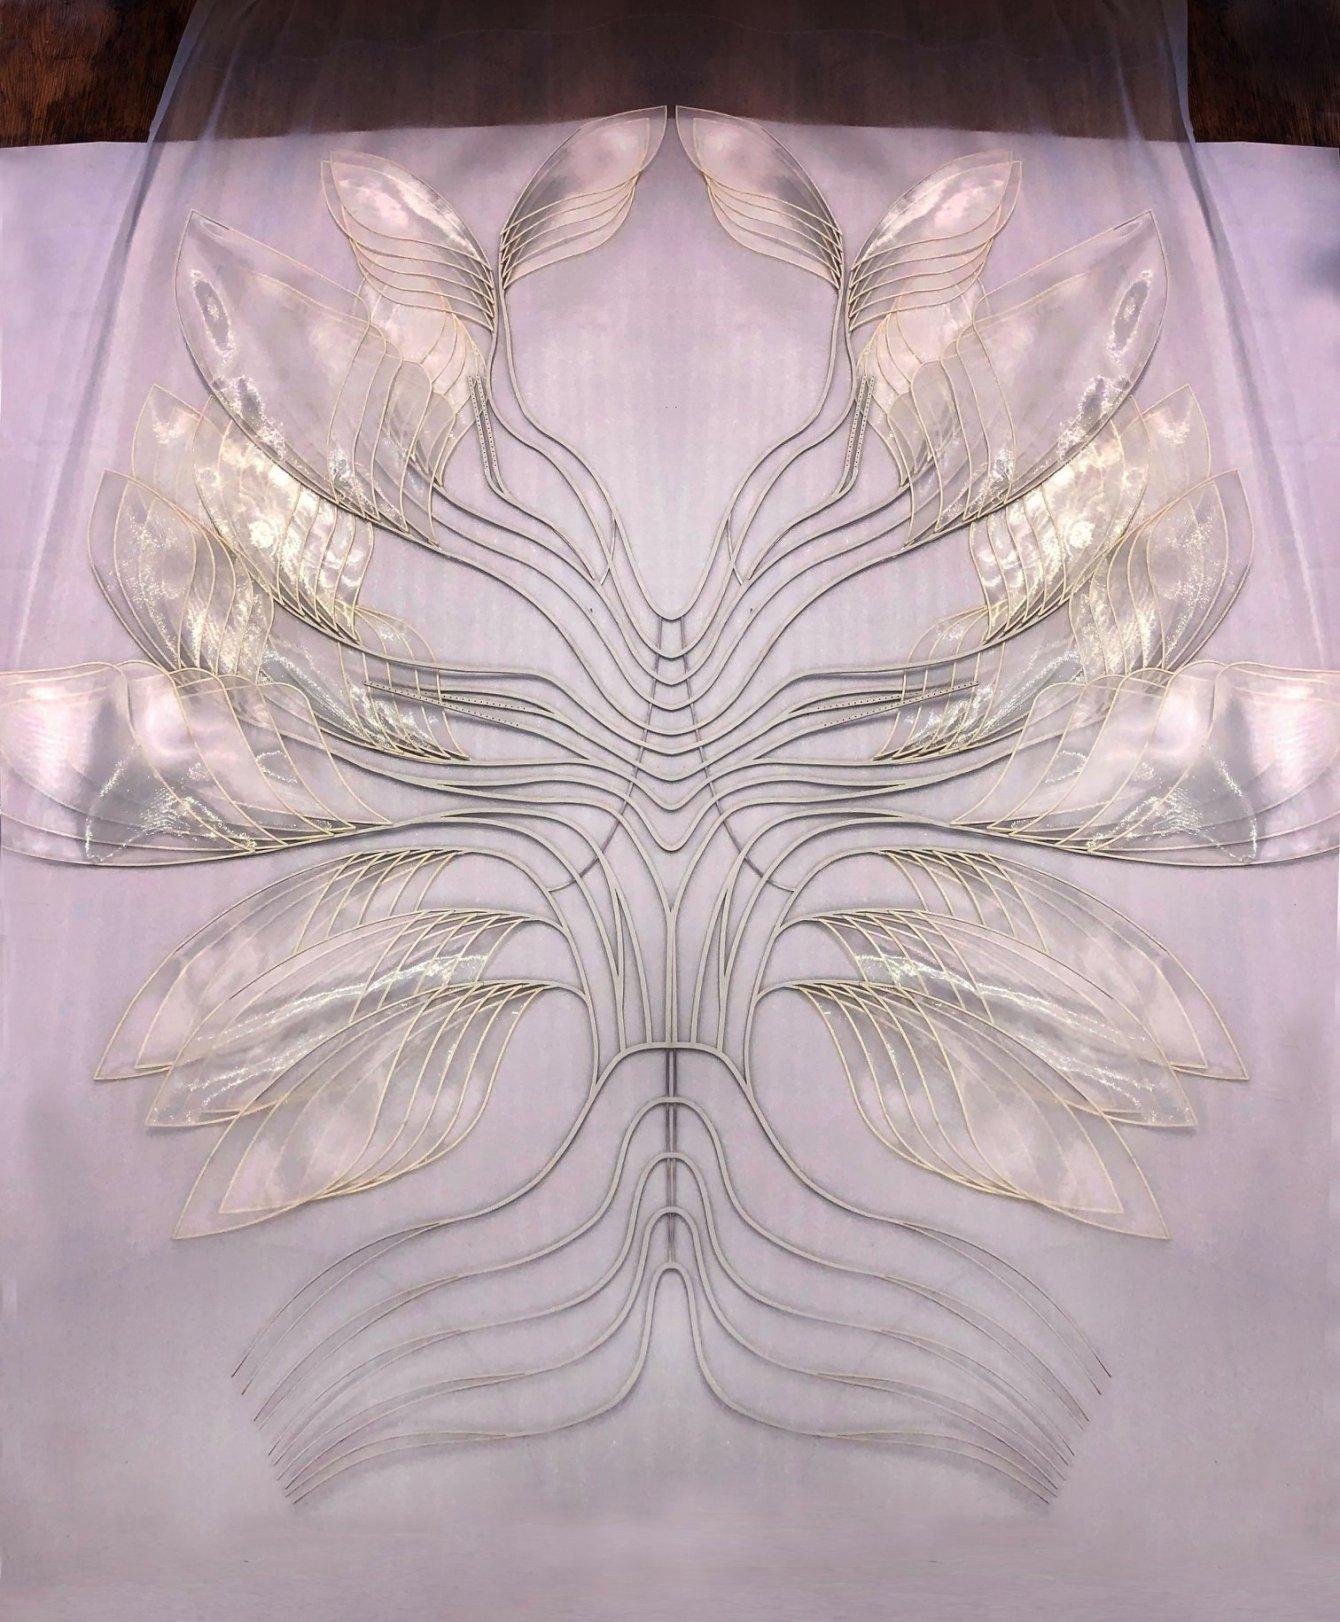 Iris-van-Herpen-making-of-Bjork-Cornucopia-11_1